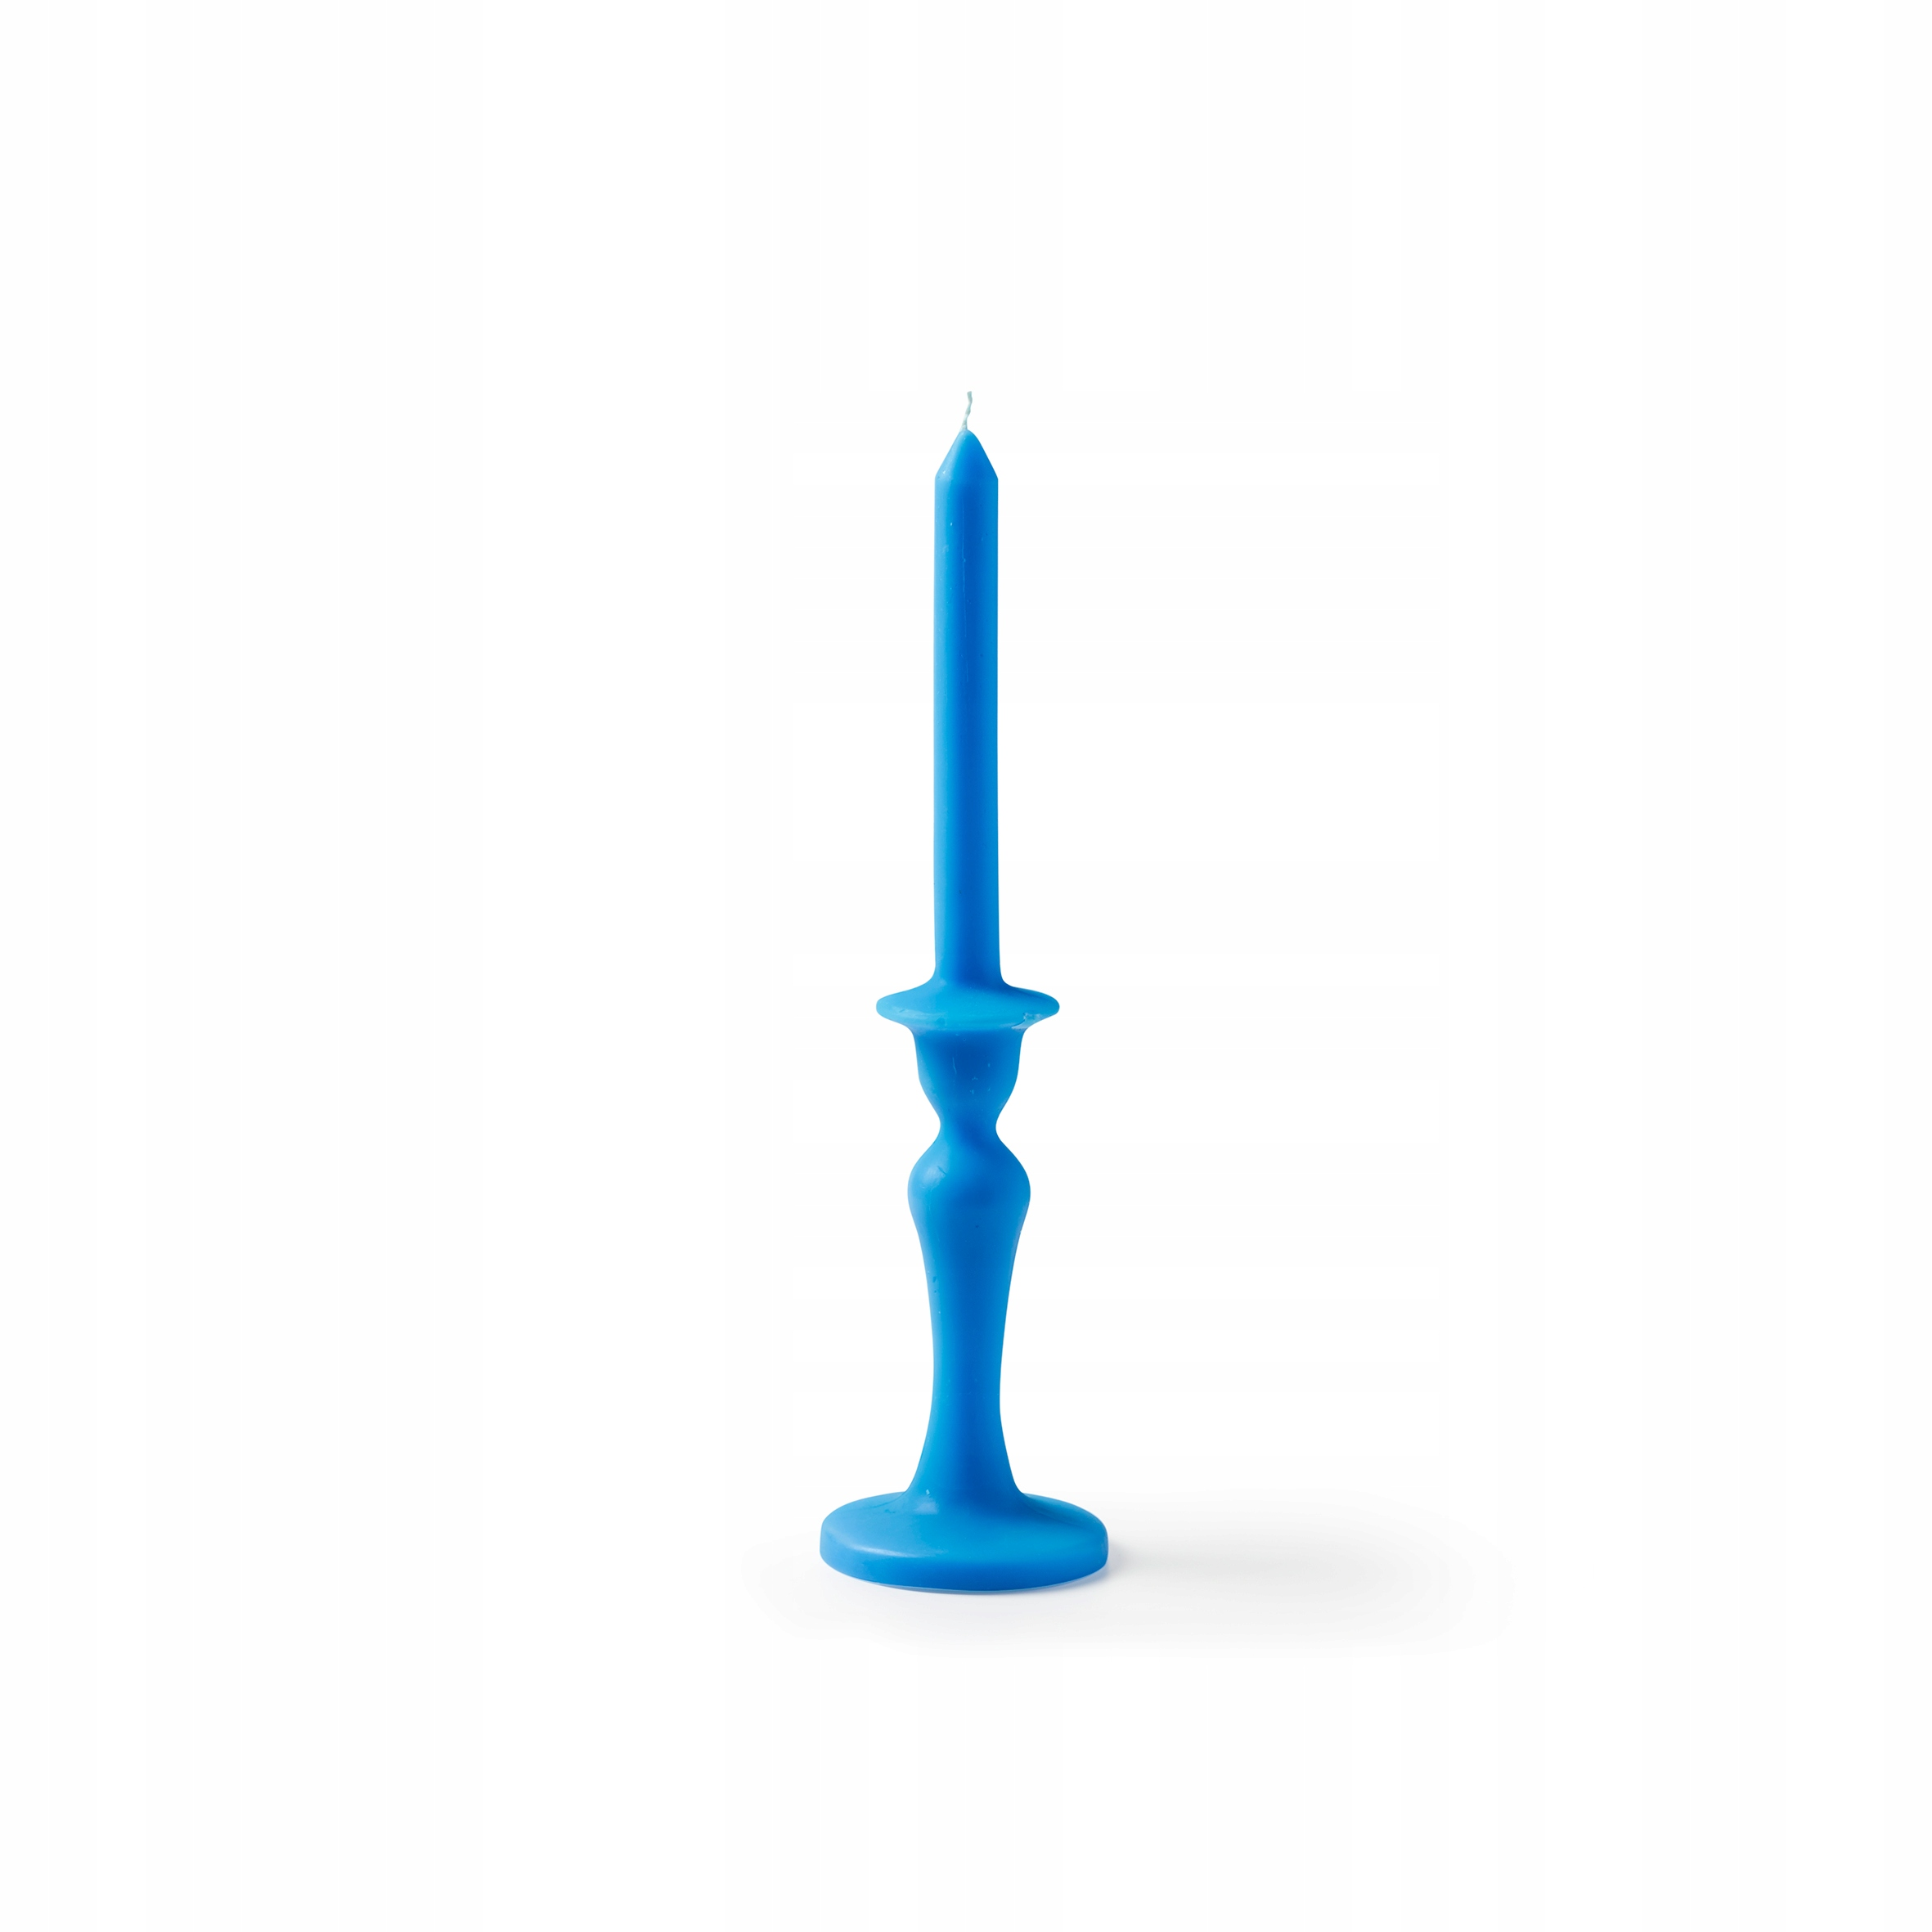 Modrá retro sviečka - doba horenia 10-12h